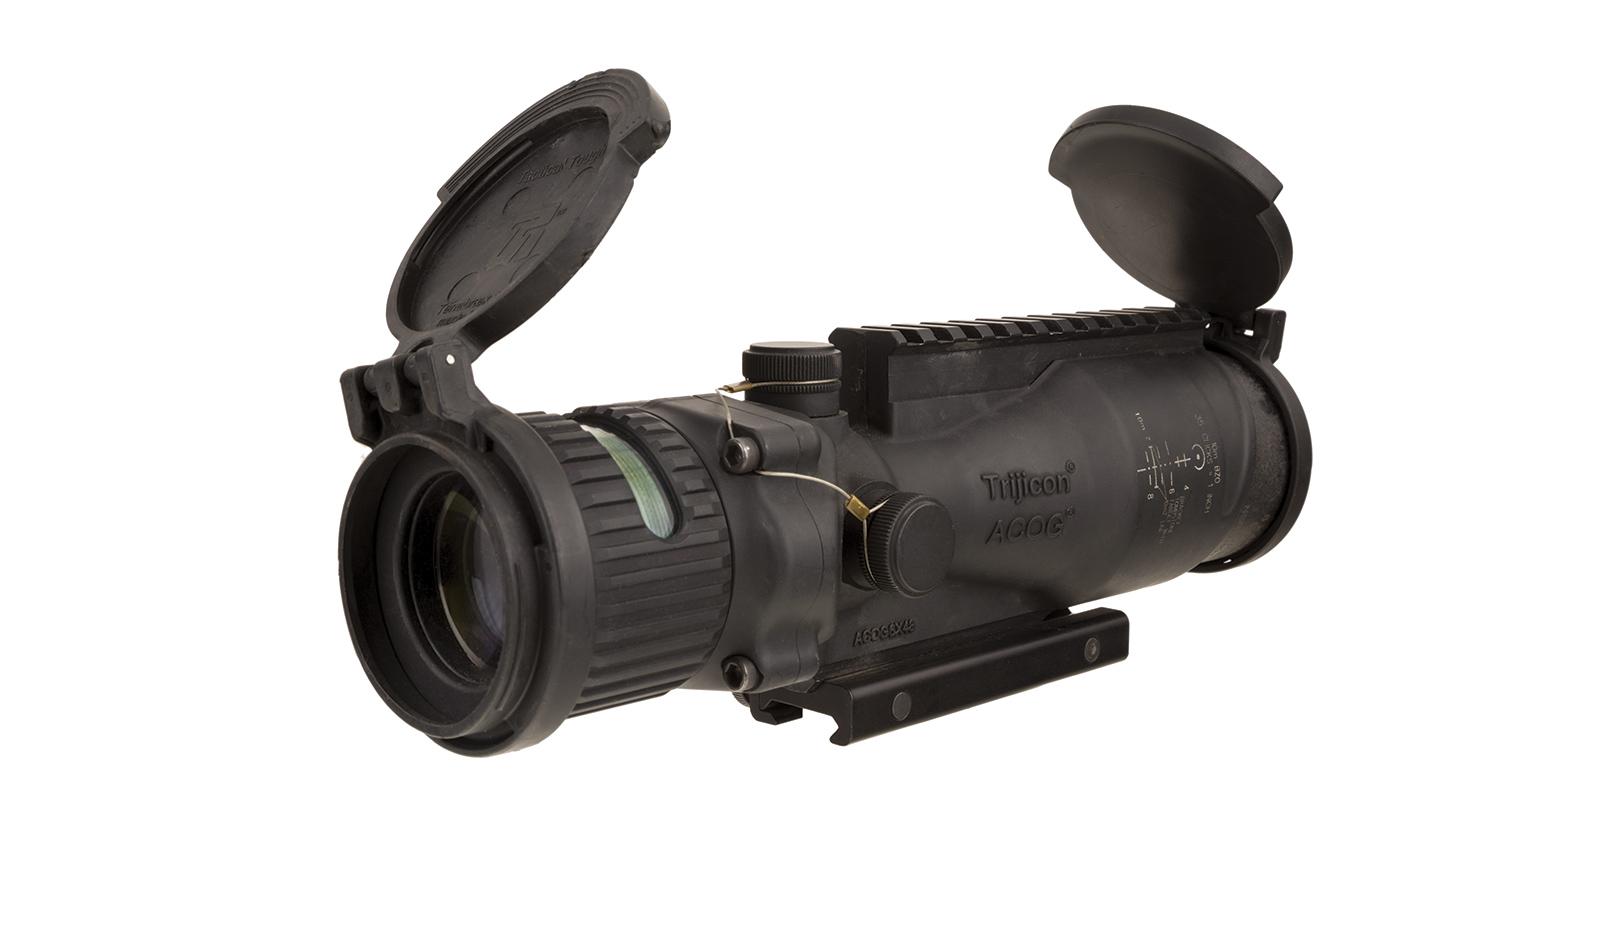 TA648MGO-M240 angle 4